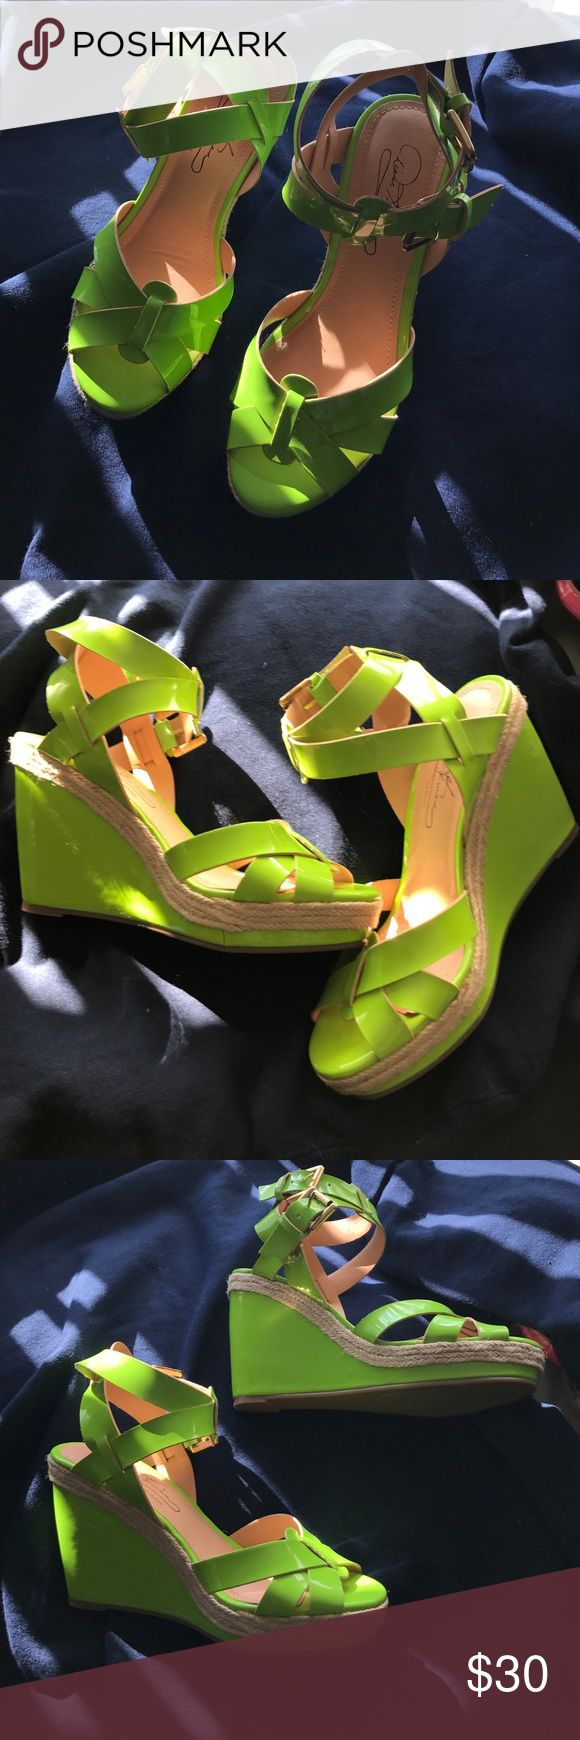 Bright Green Diane Gilman Wedges sz 6 1/2 Bright neon Green wedge Sandals by Diane Gilman. They are new. Size 6 1/2. Diane Gilman Shoes Wedges